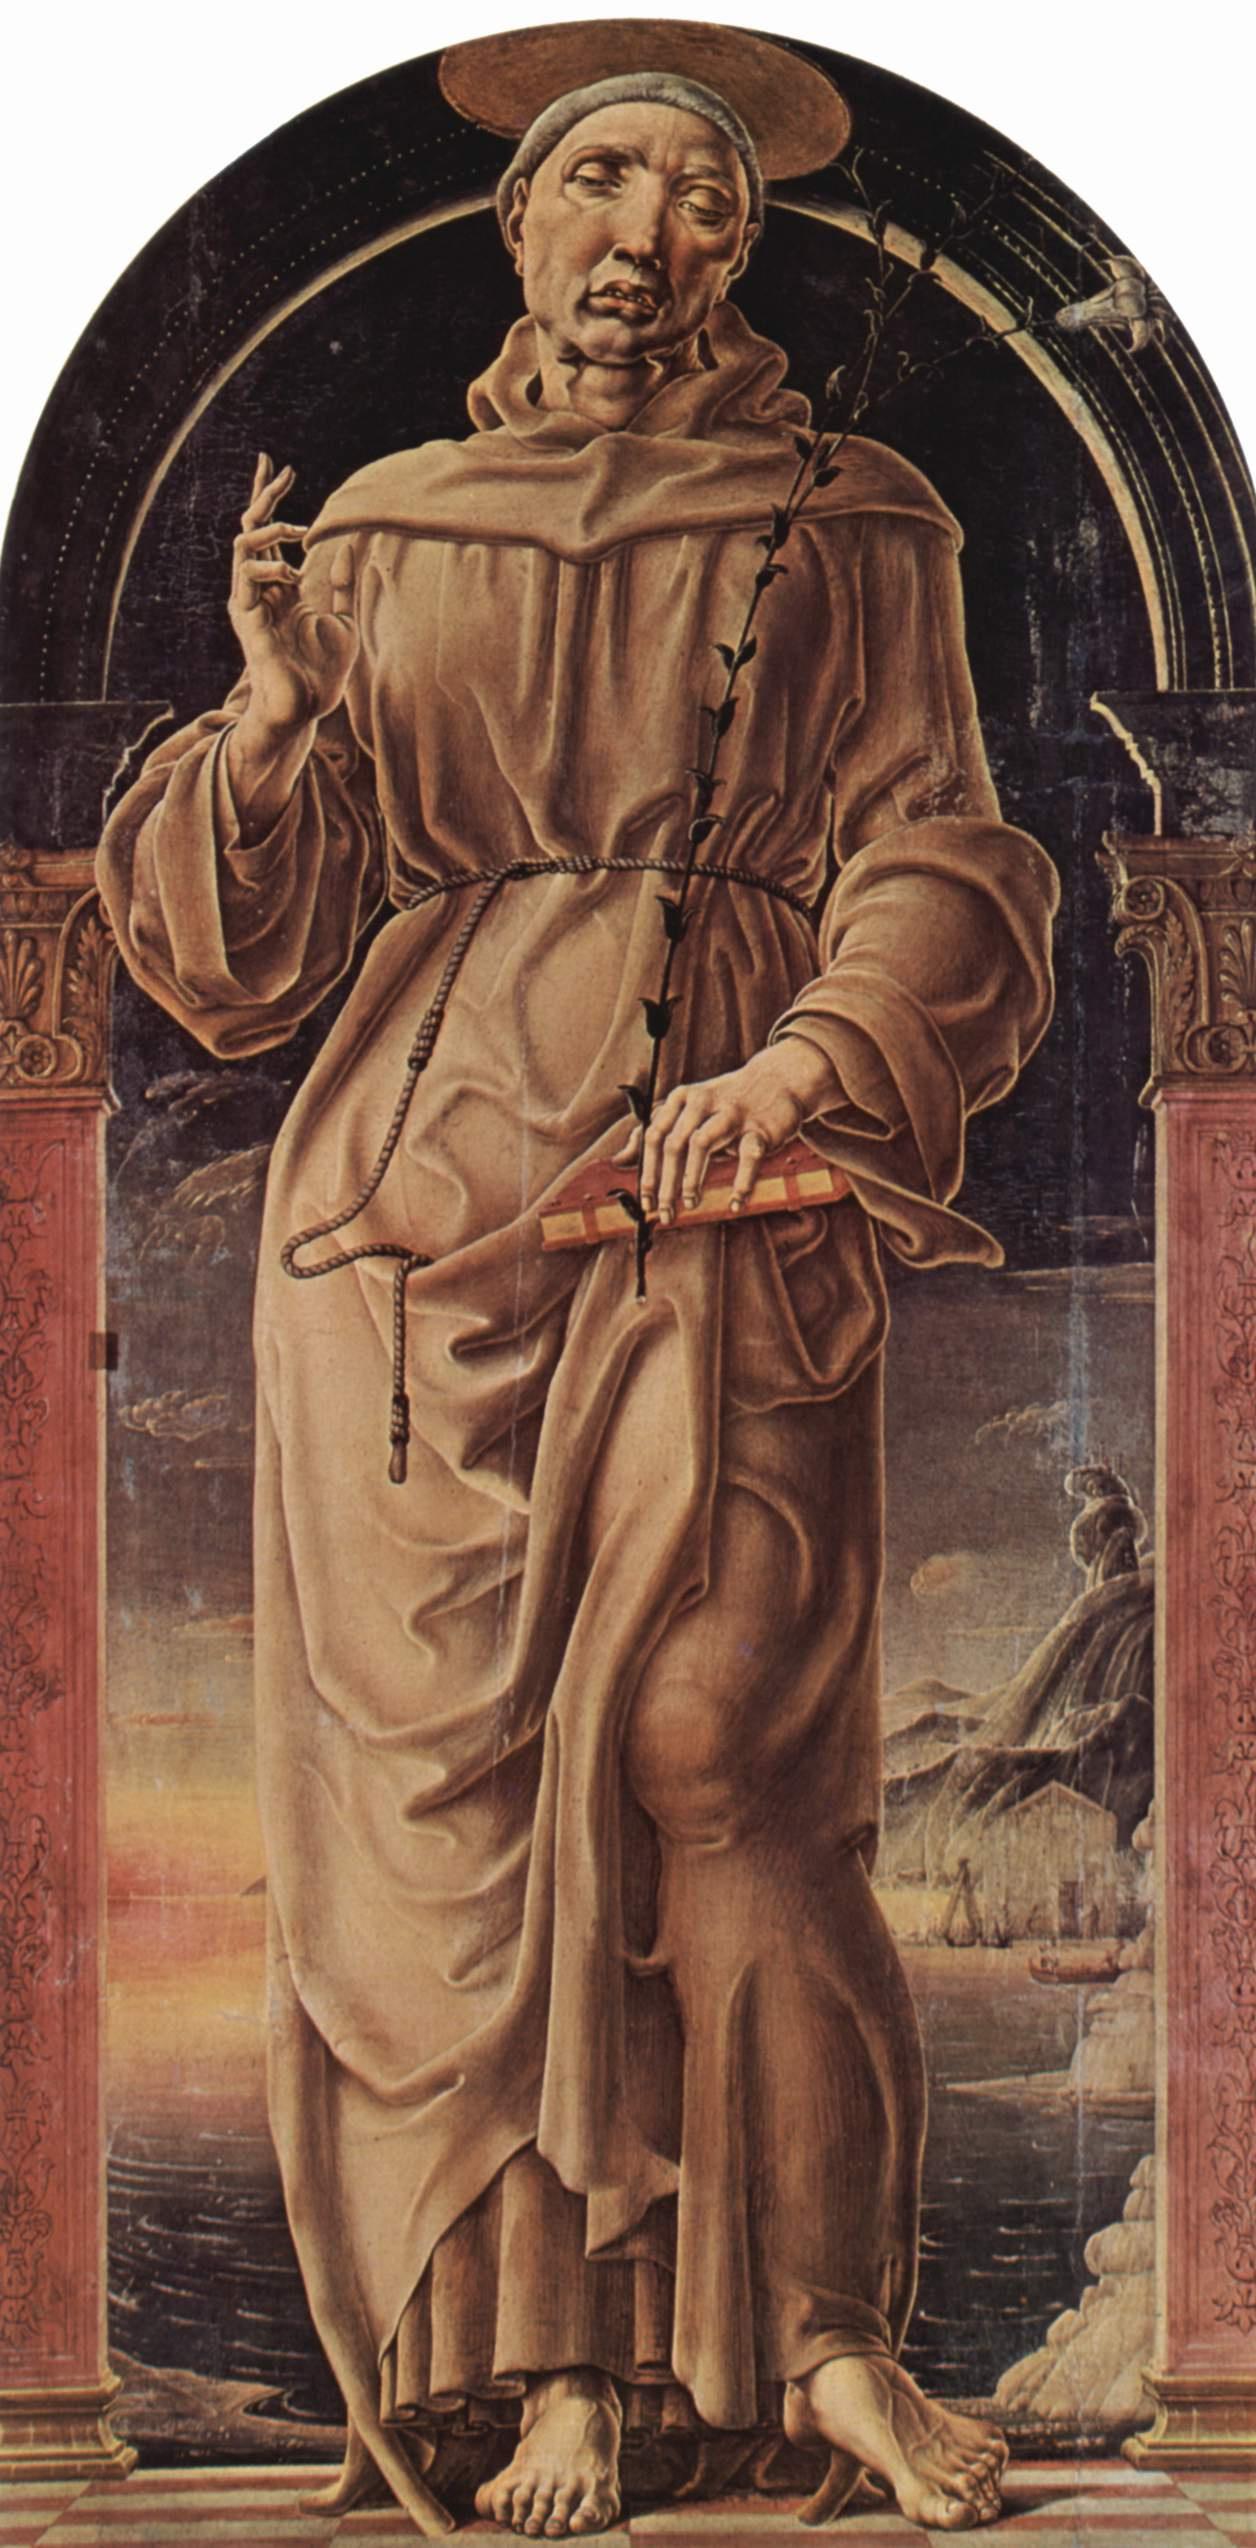 Cosimo Tour. SV. Anthony Of Padua